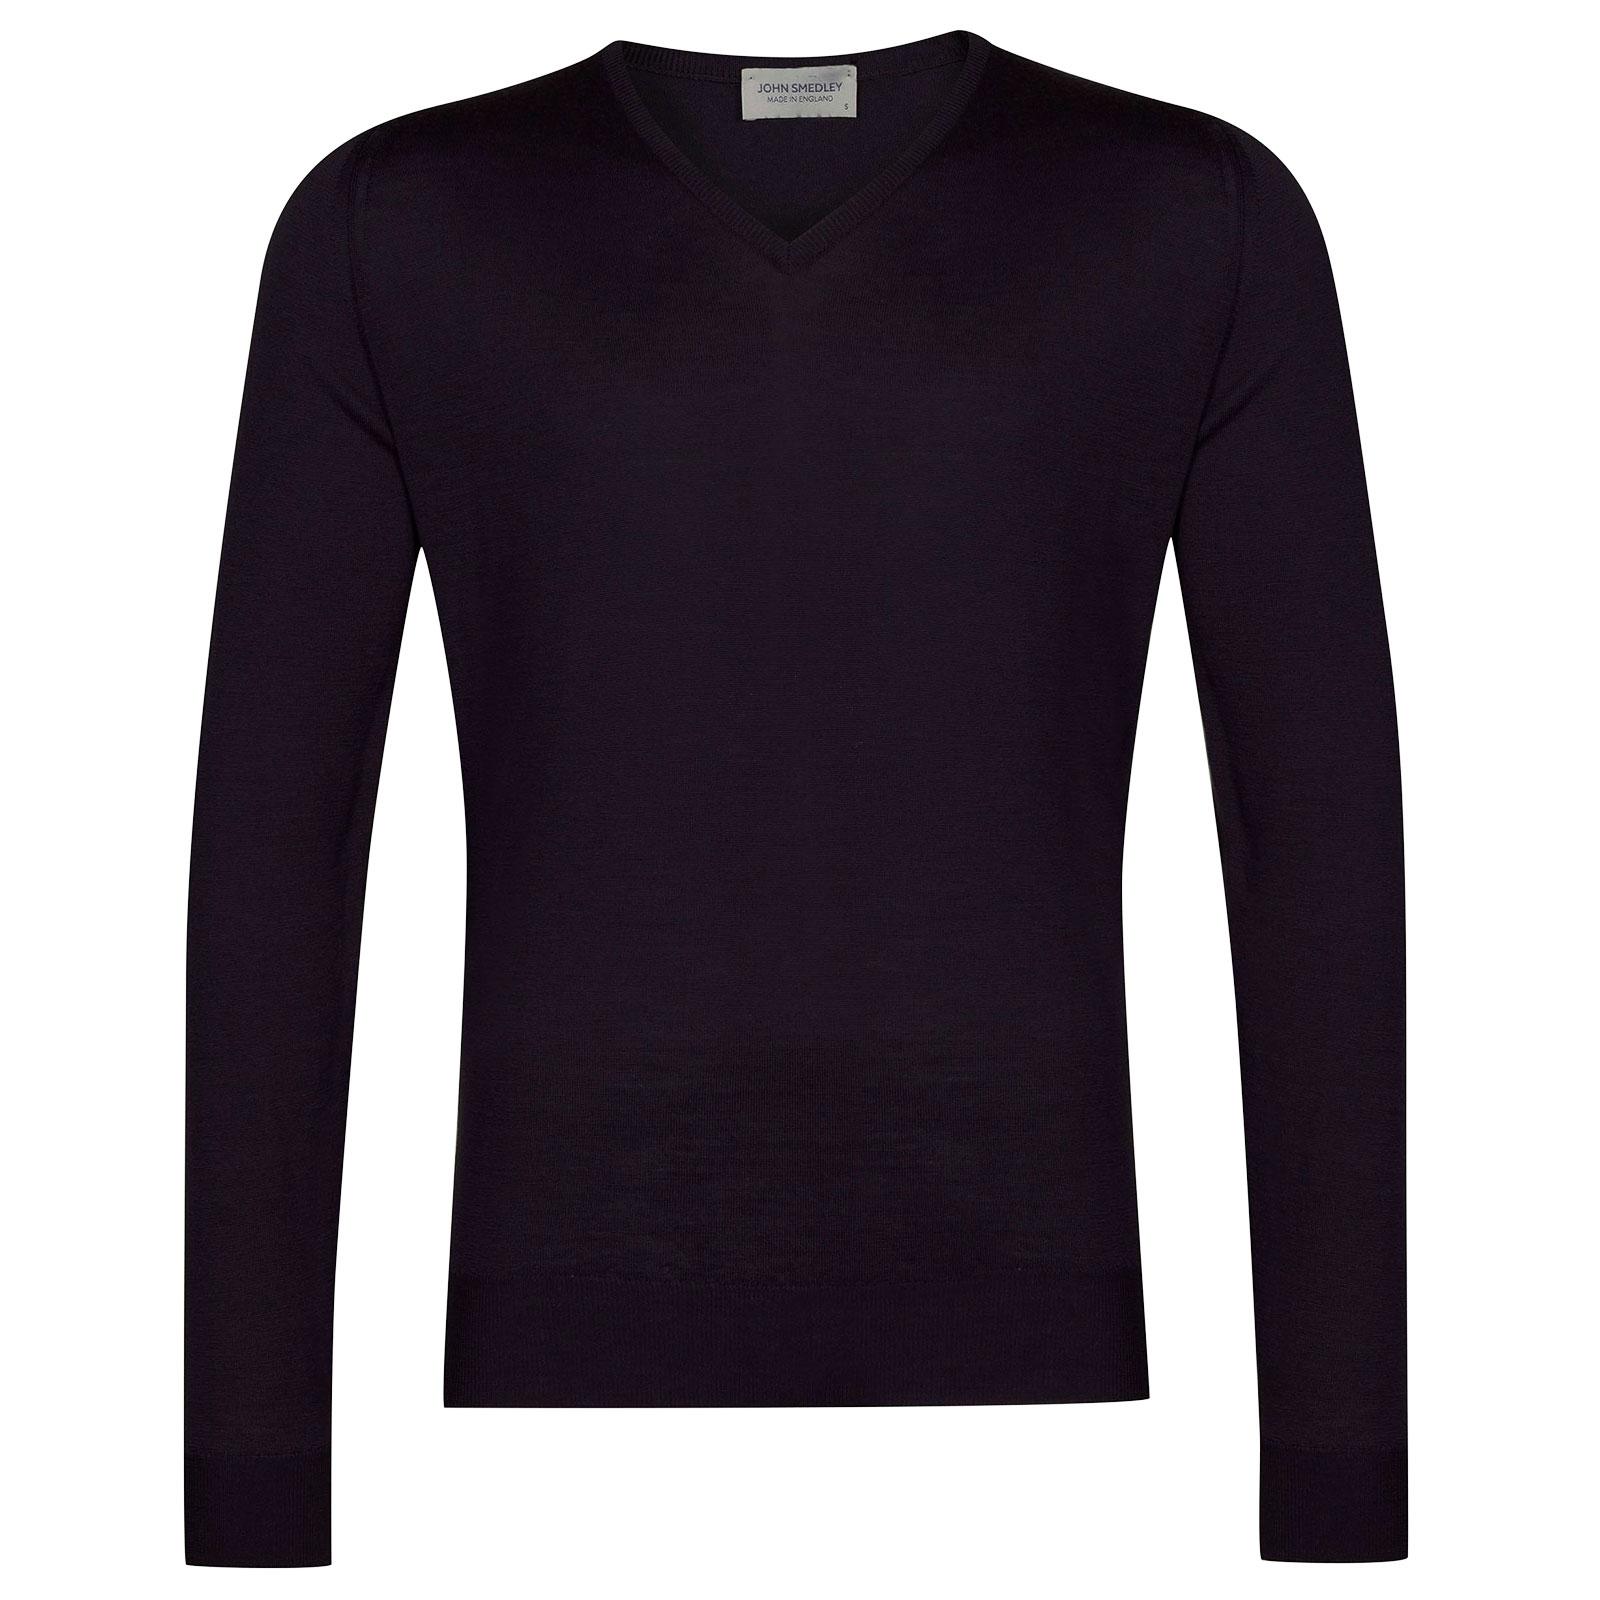 John Smedley Blenheim Merino Wool Pullover in Mystic Purple-L